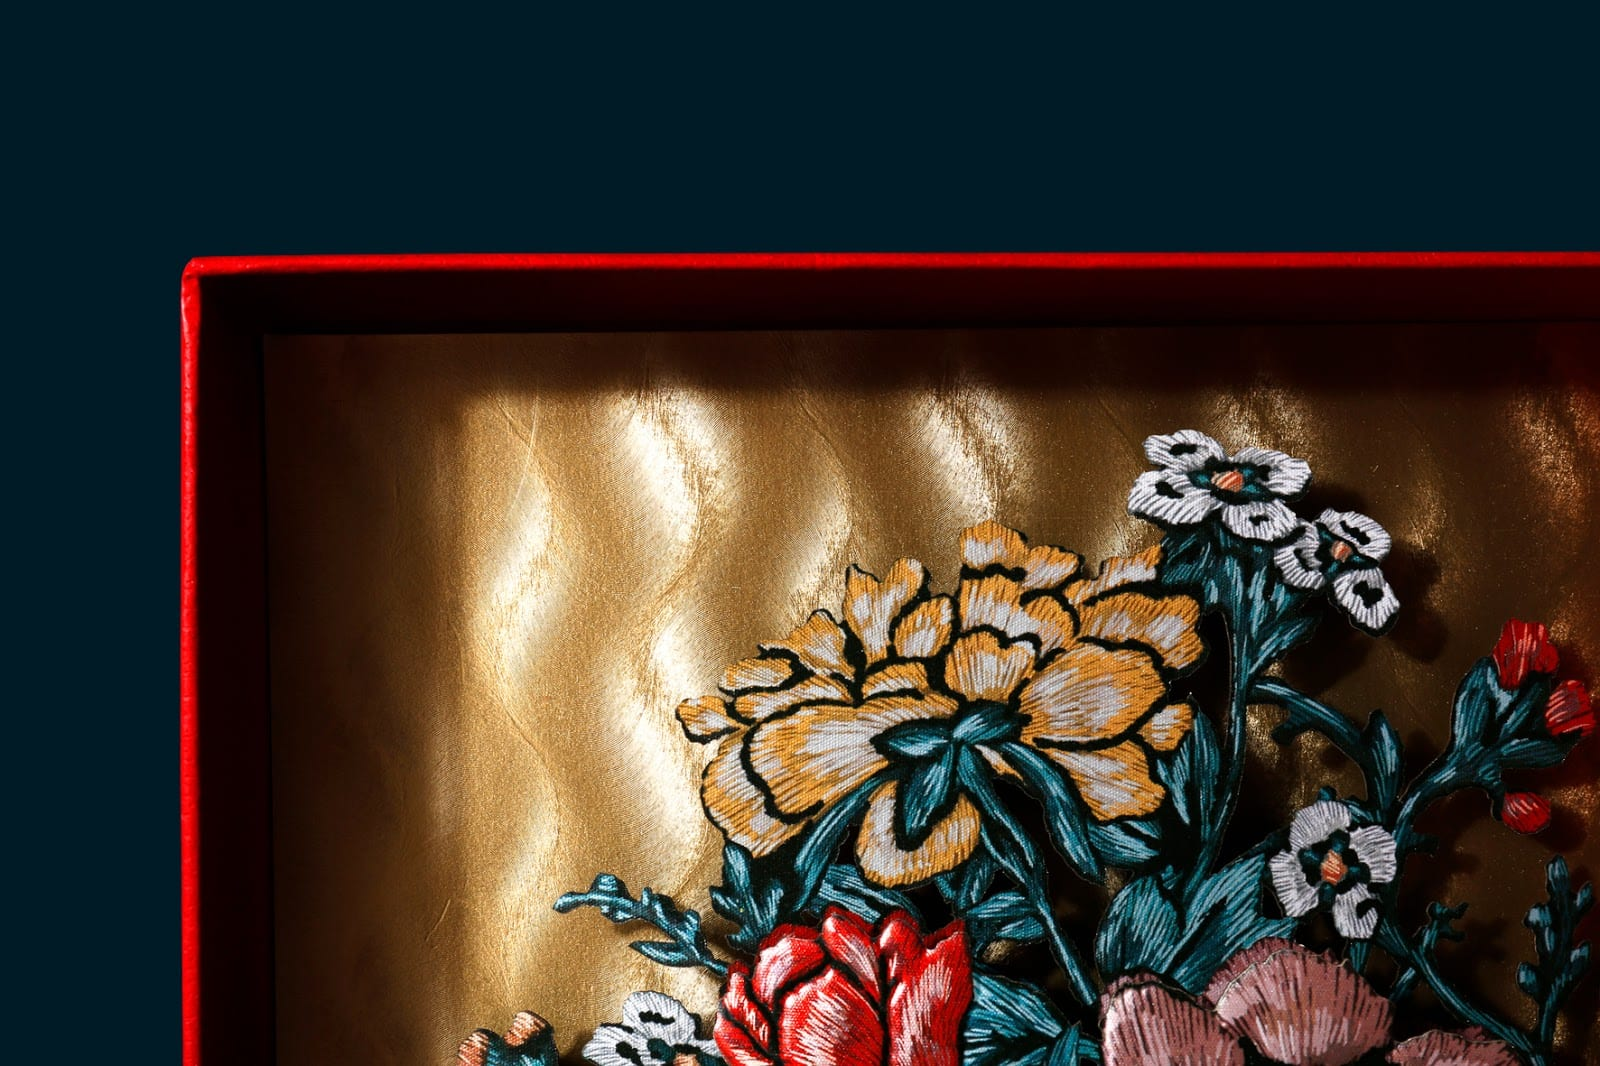 fendi cny delux 07 - Fendi Red Packet 2019